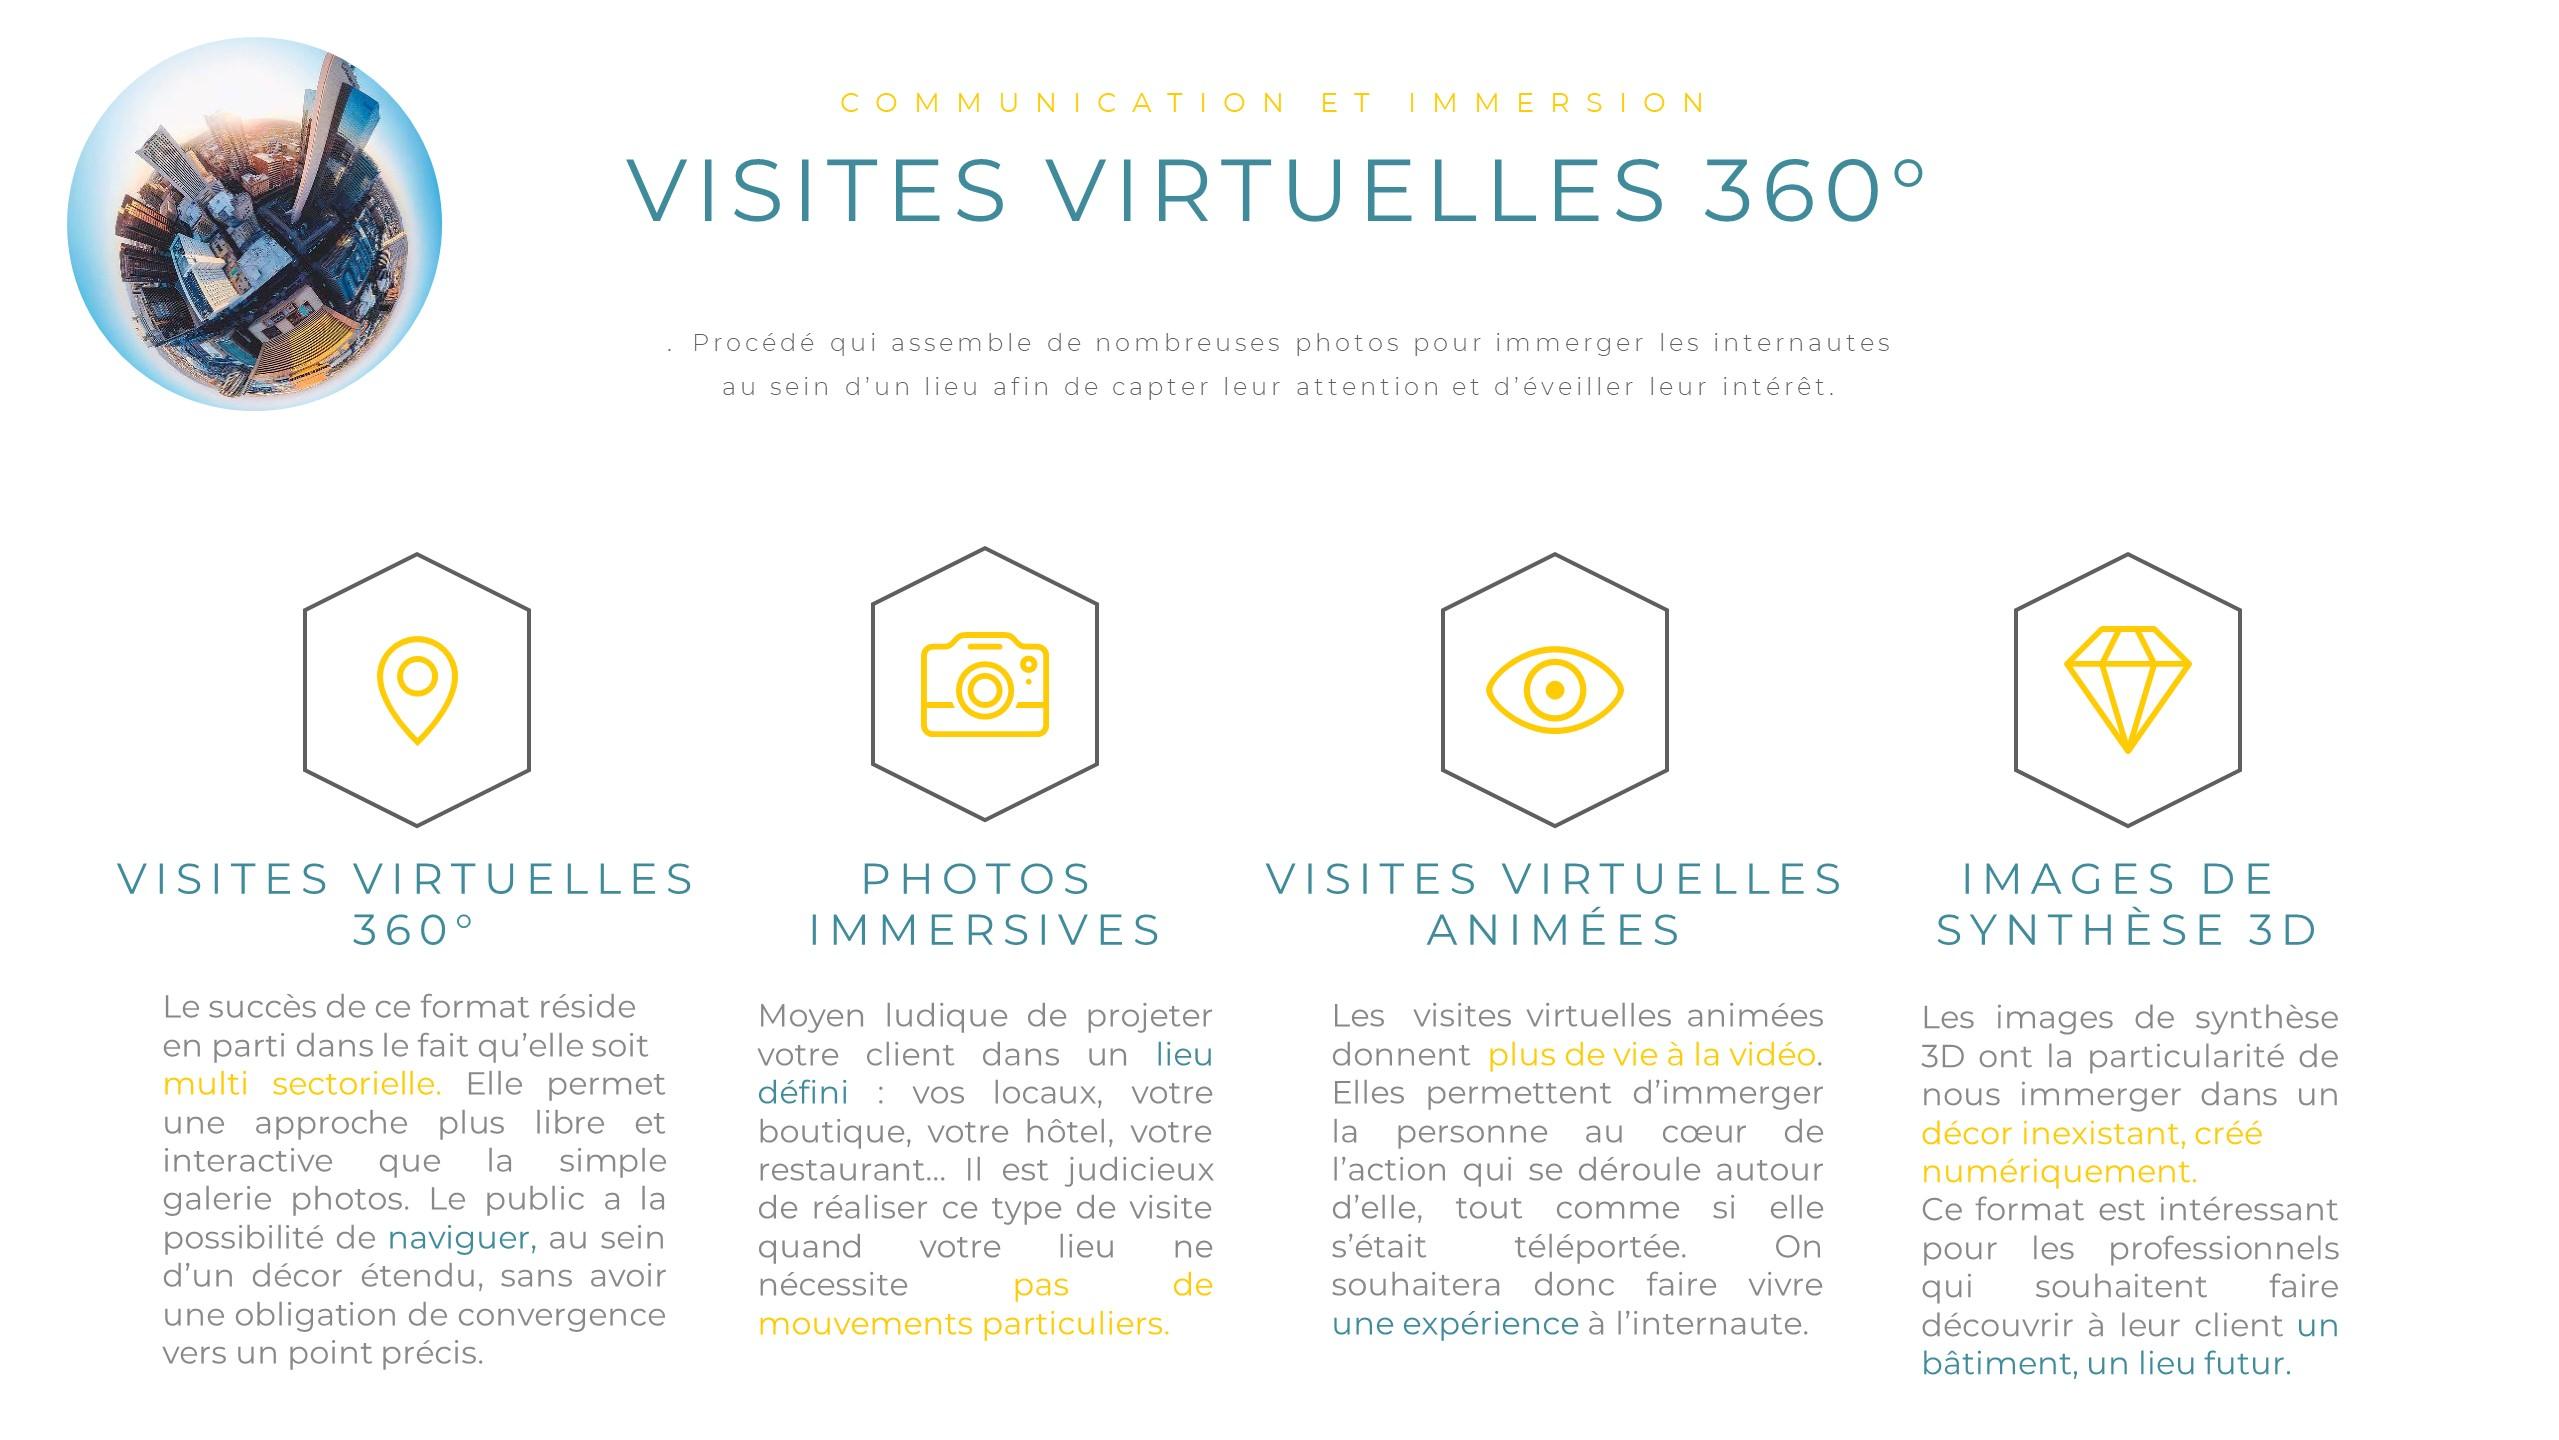 visites-virtuelles-360-resume